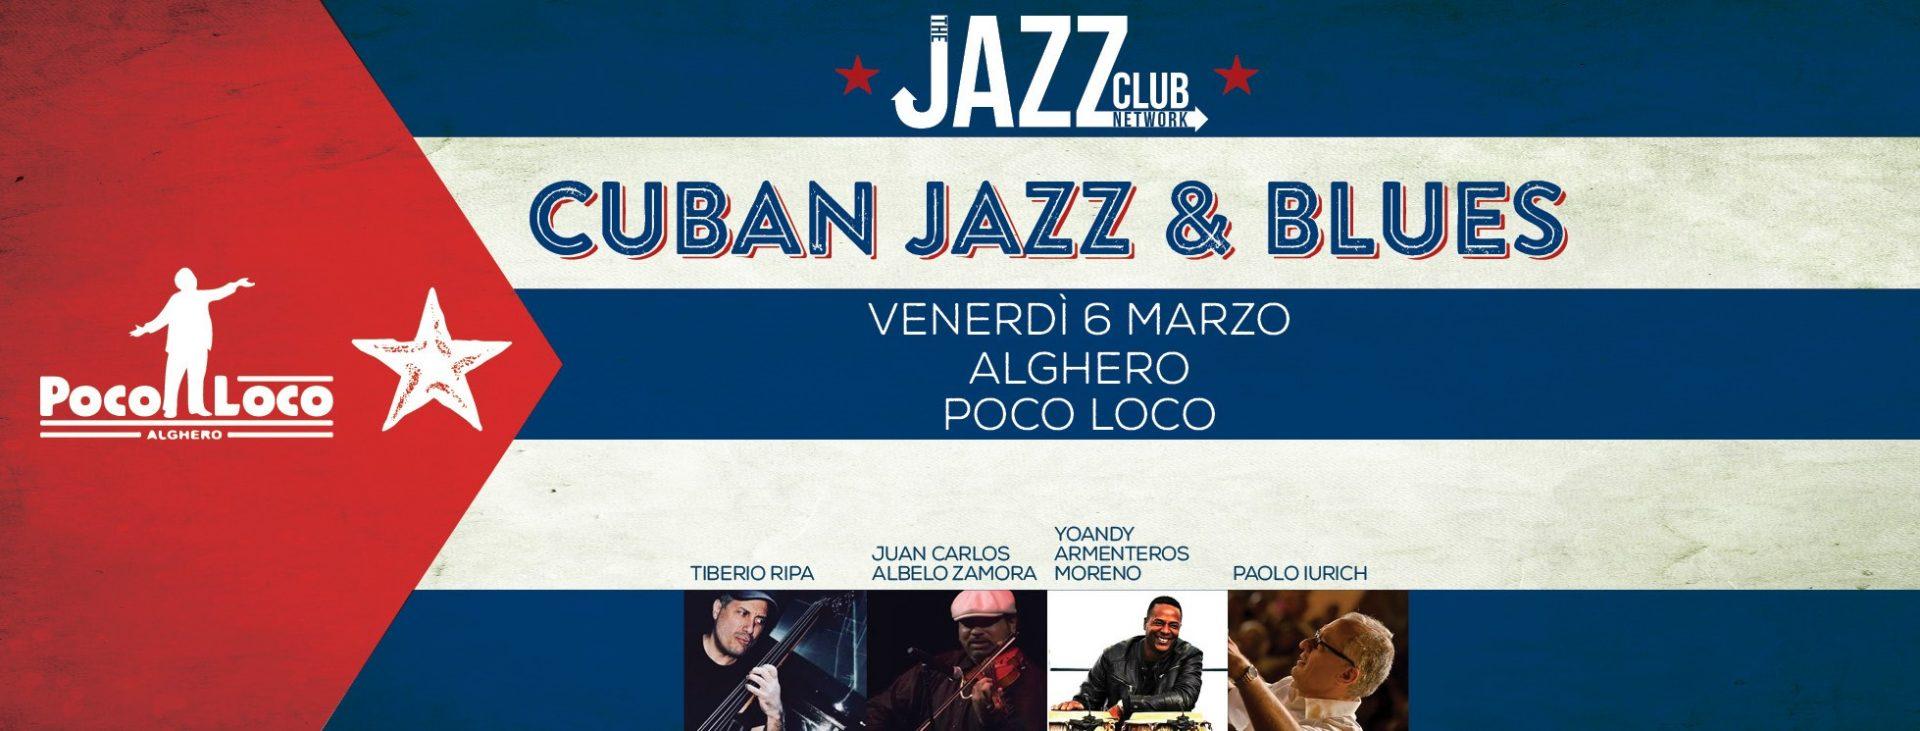 Jazz Club Network - Cuban Jazz & Blues - Poco Loco - Alghero - 6 marzo 2020 - eventi - 2020 - Sa Scena Sarda